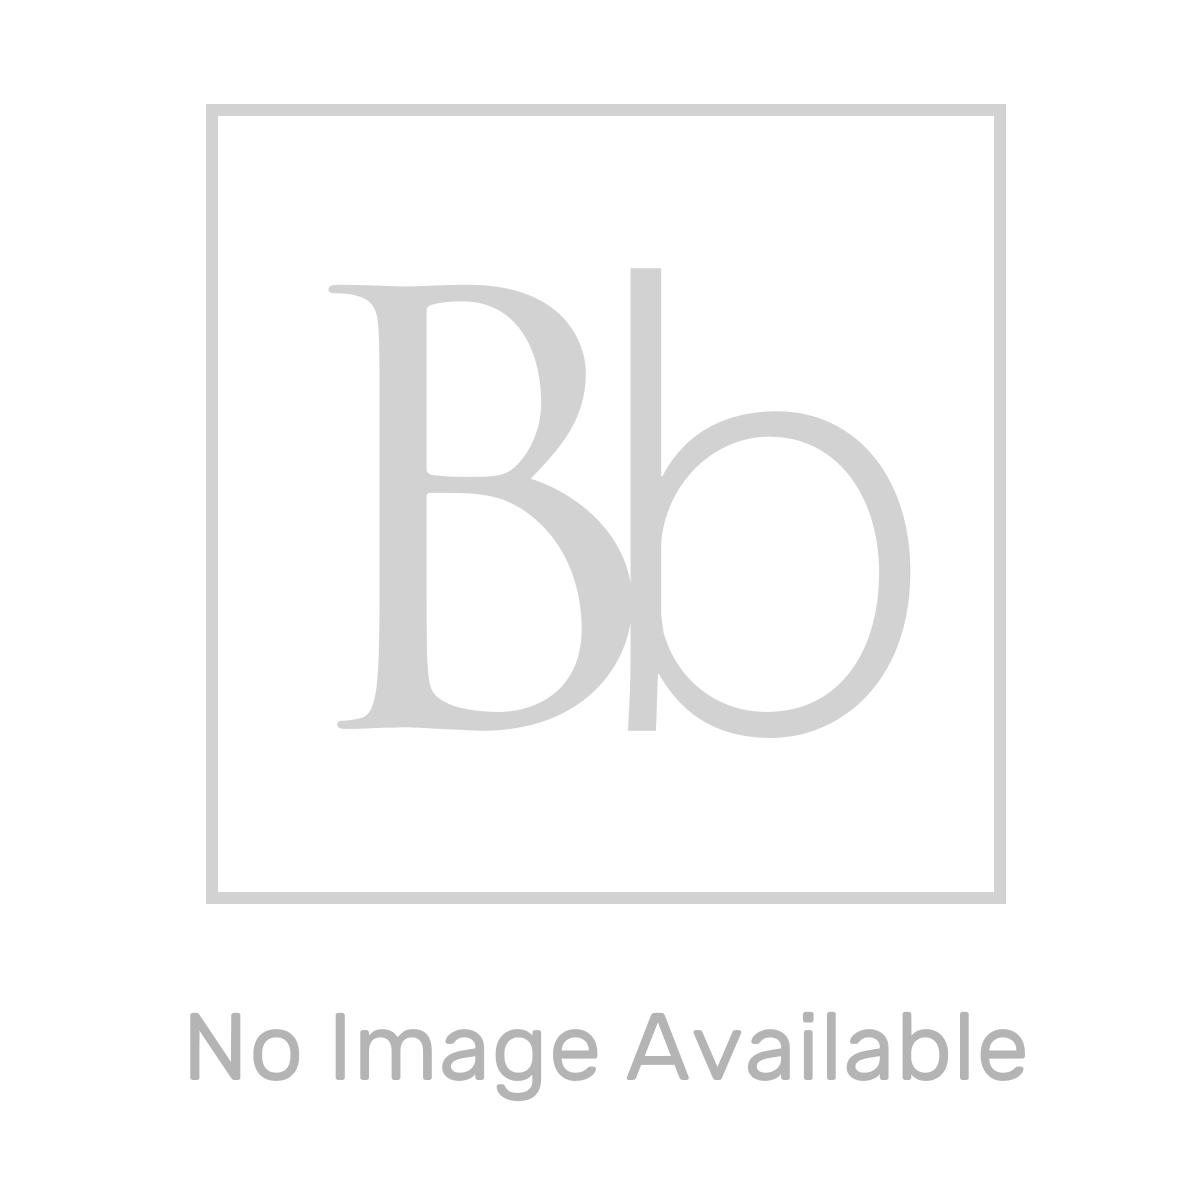 Nuie Pacific Quadrant Shower Enclosure Dimensions